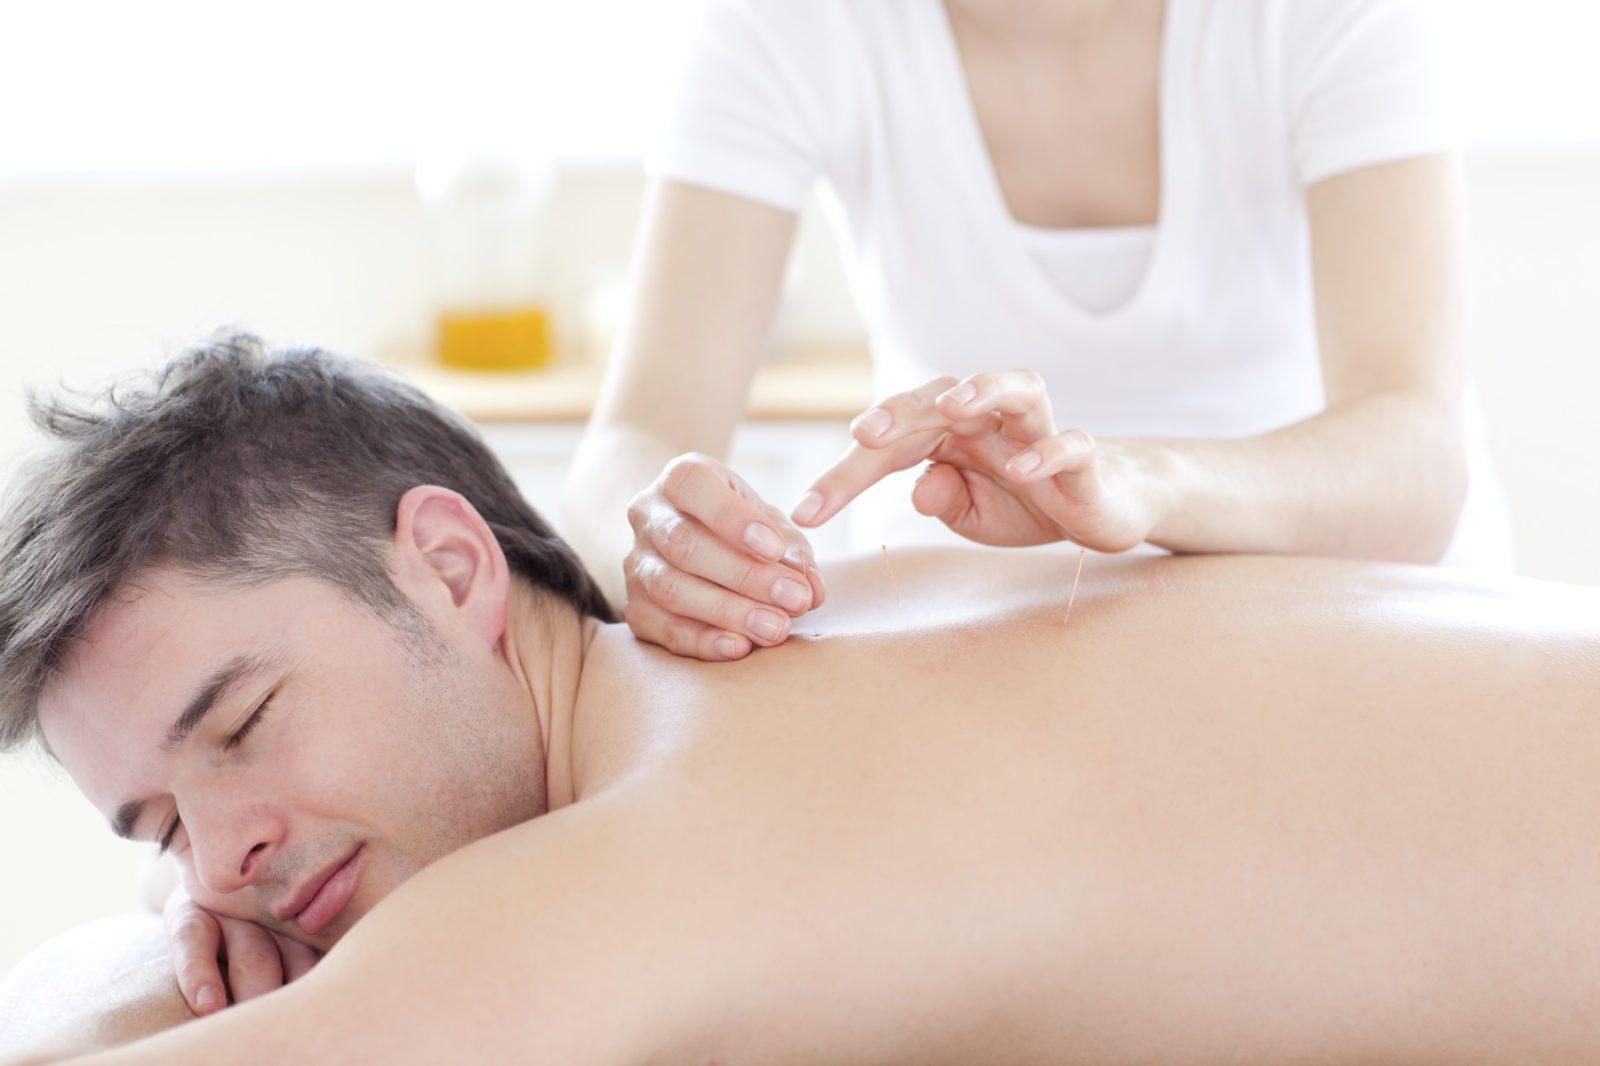 Acupuncture & chiropractic